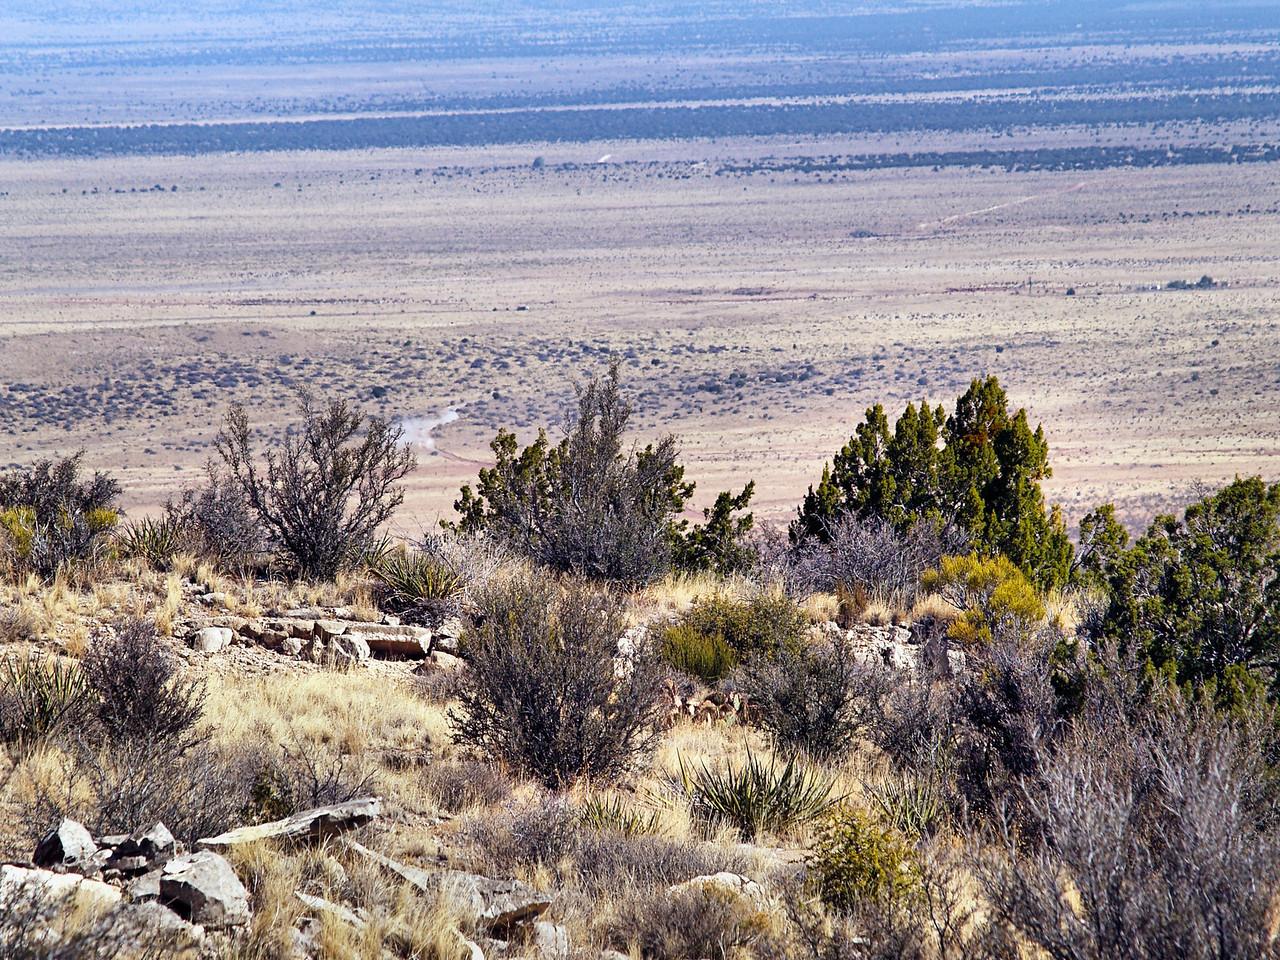 OLYMPUS DIGITAL CAMERA--Overlooking the desert floor.